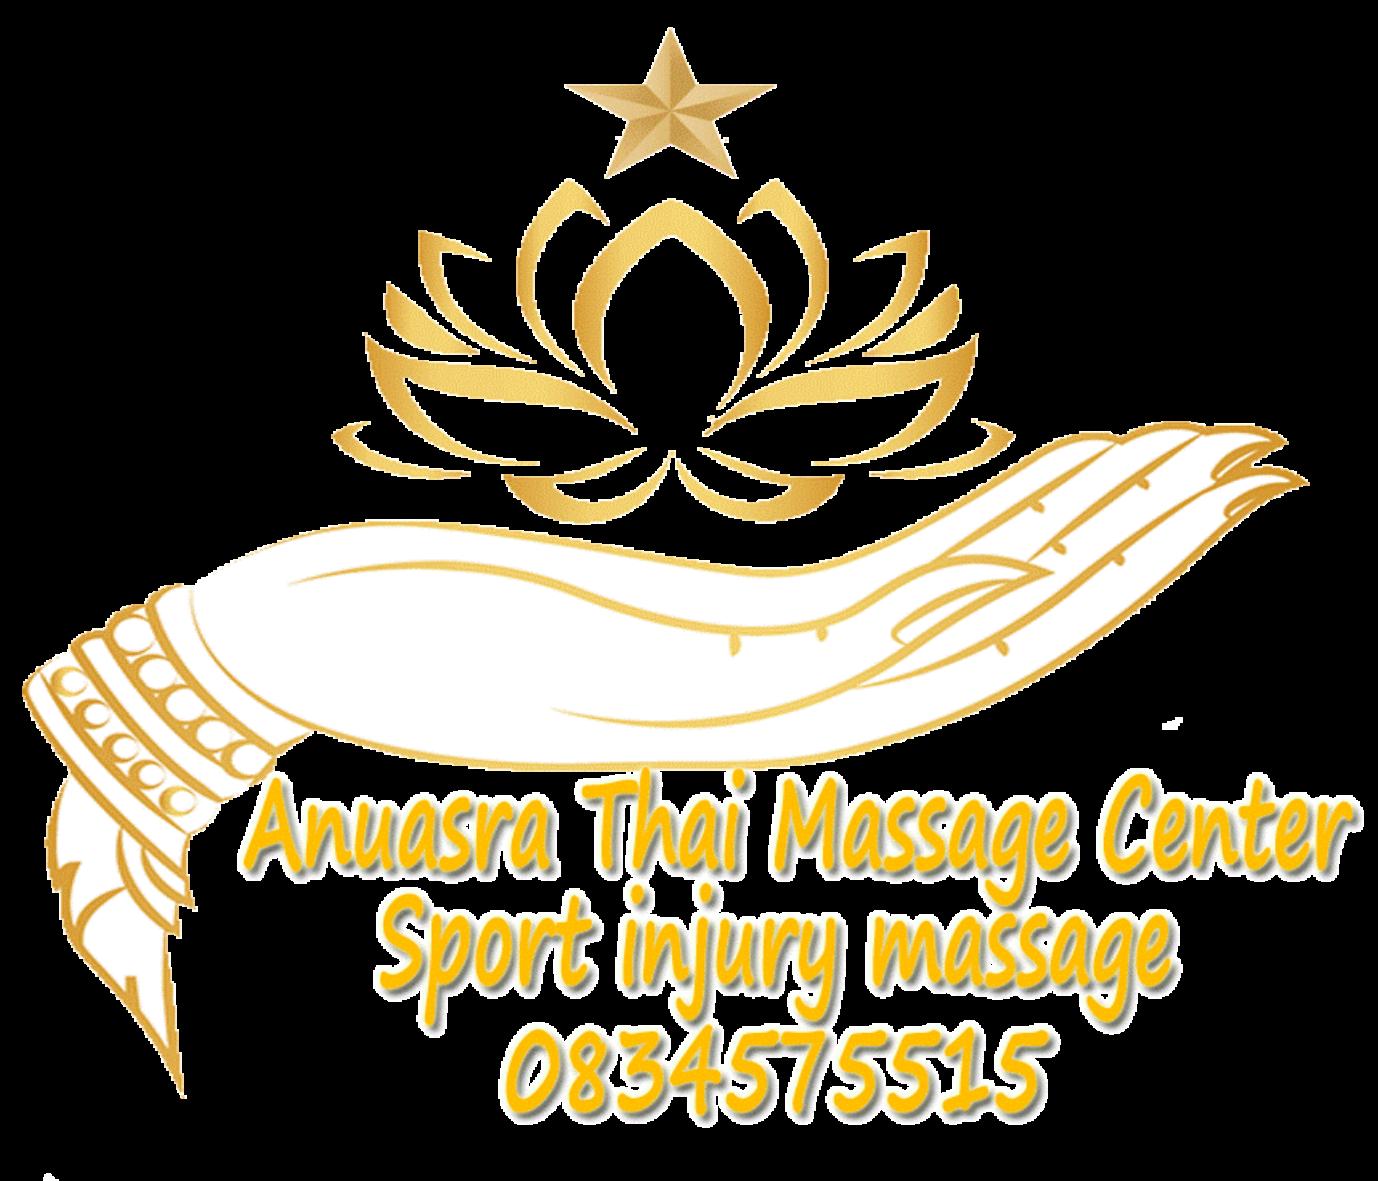 Anusara Thai Massage Therapy